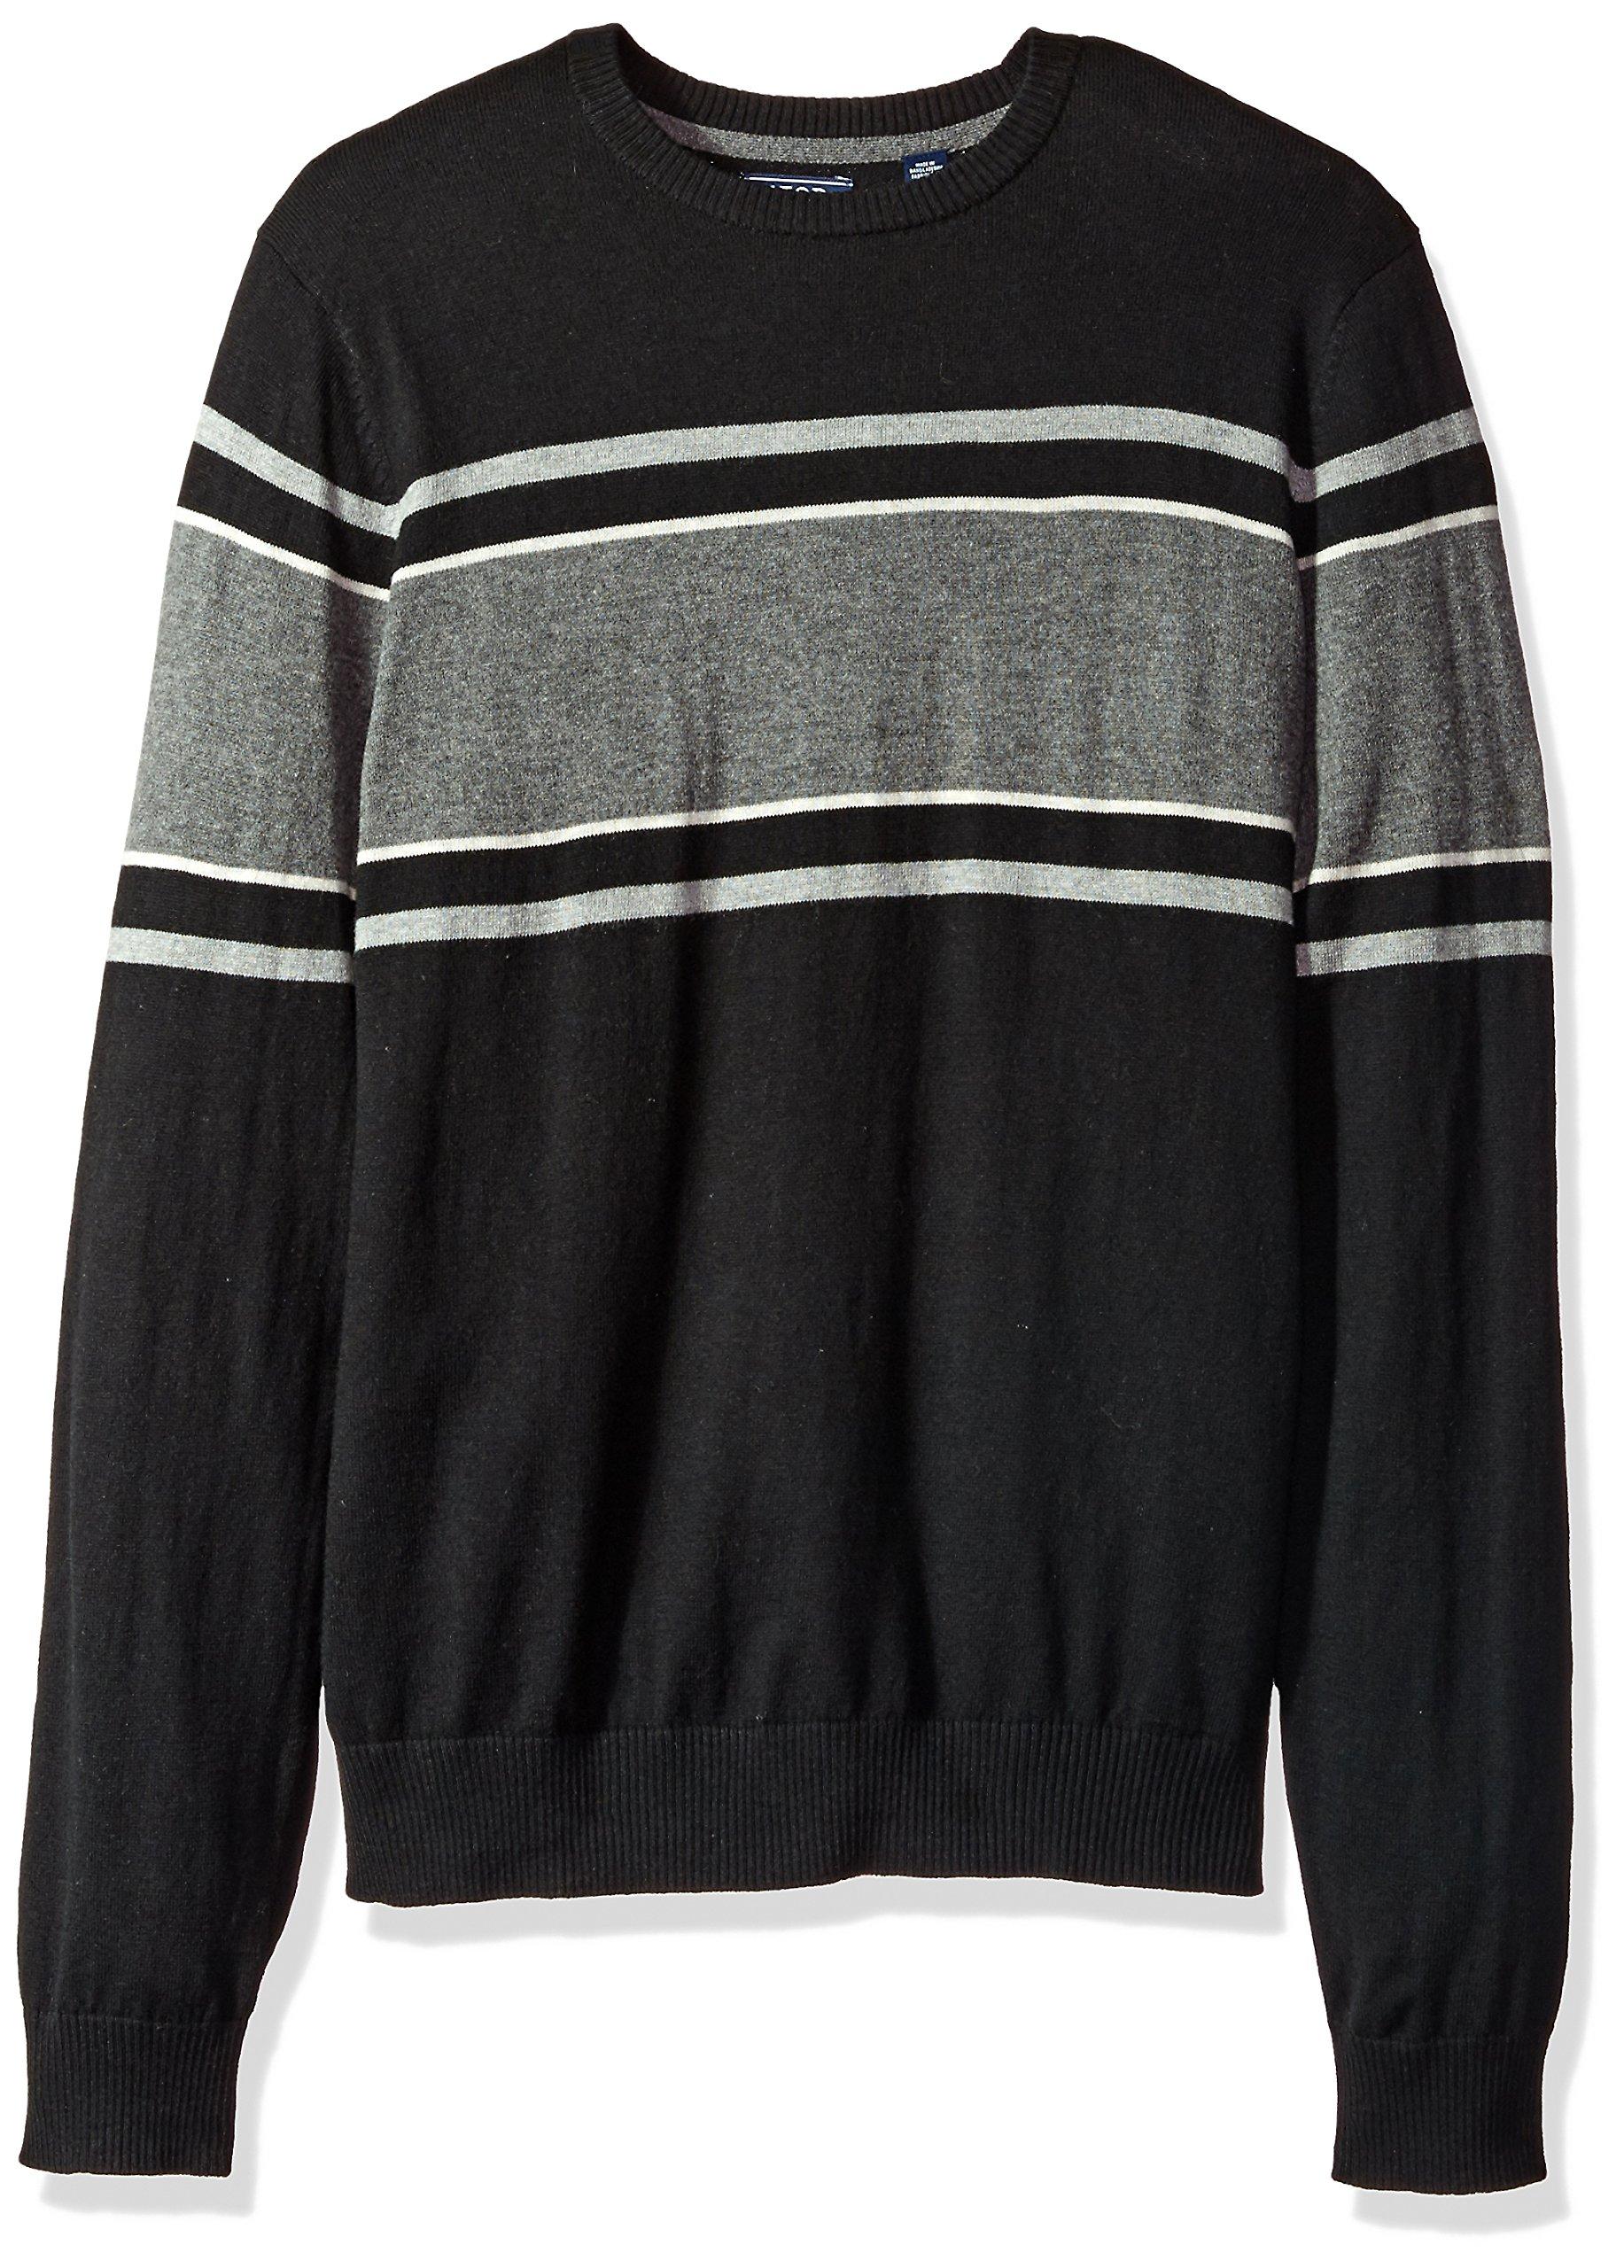 IZOD Men's Fine Gauge Crew Sweater, Black, Large